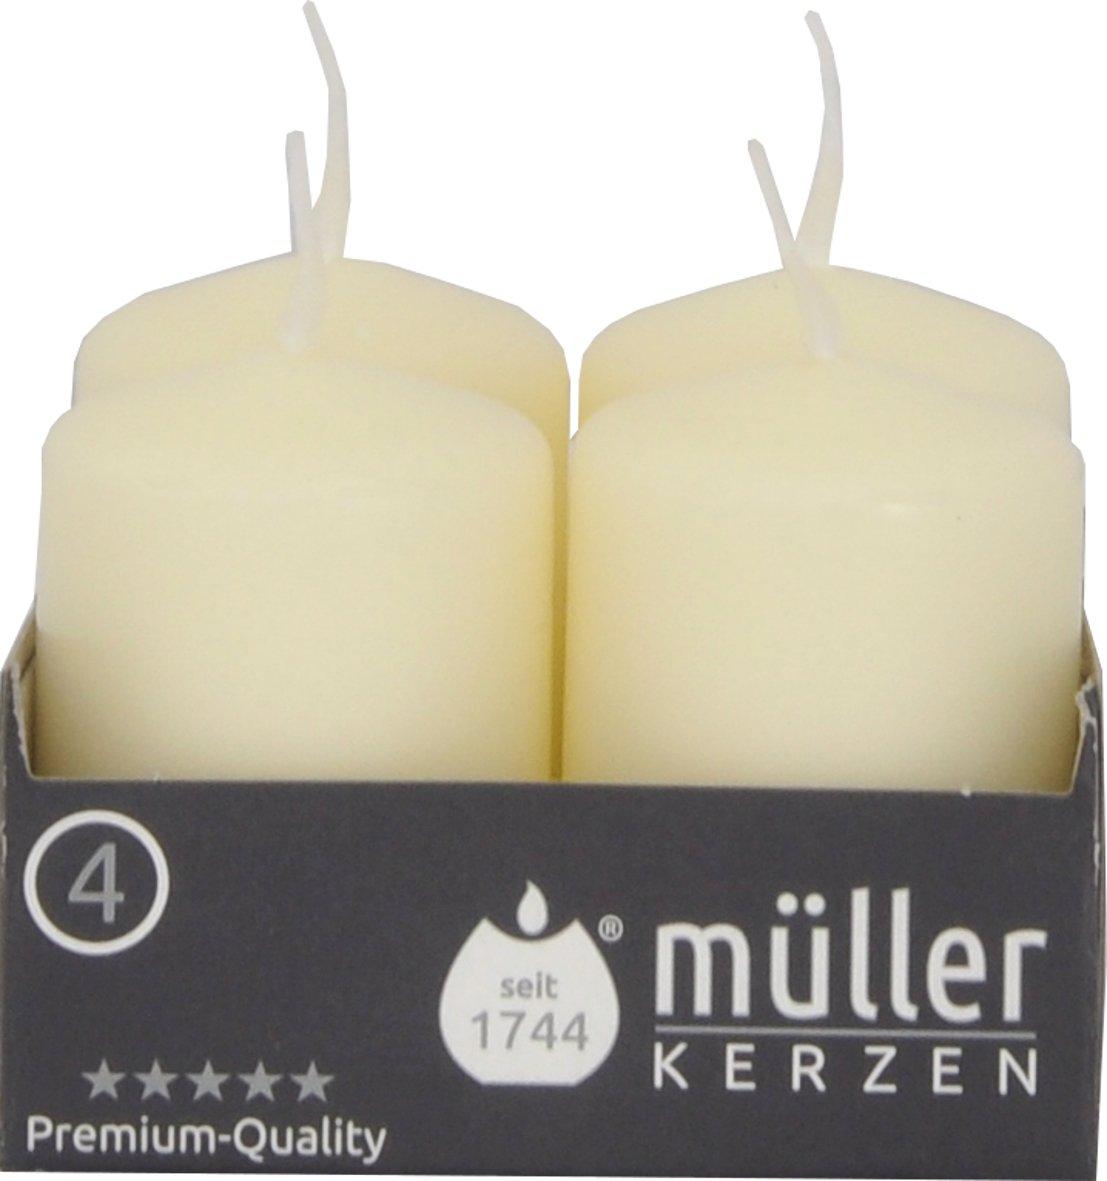 Müller Kerzen 2400624038 Set di candele a colonna, colore: Bianco, 4 pezzi